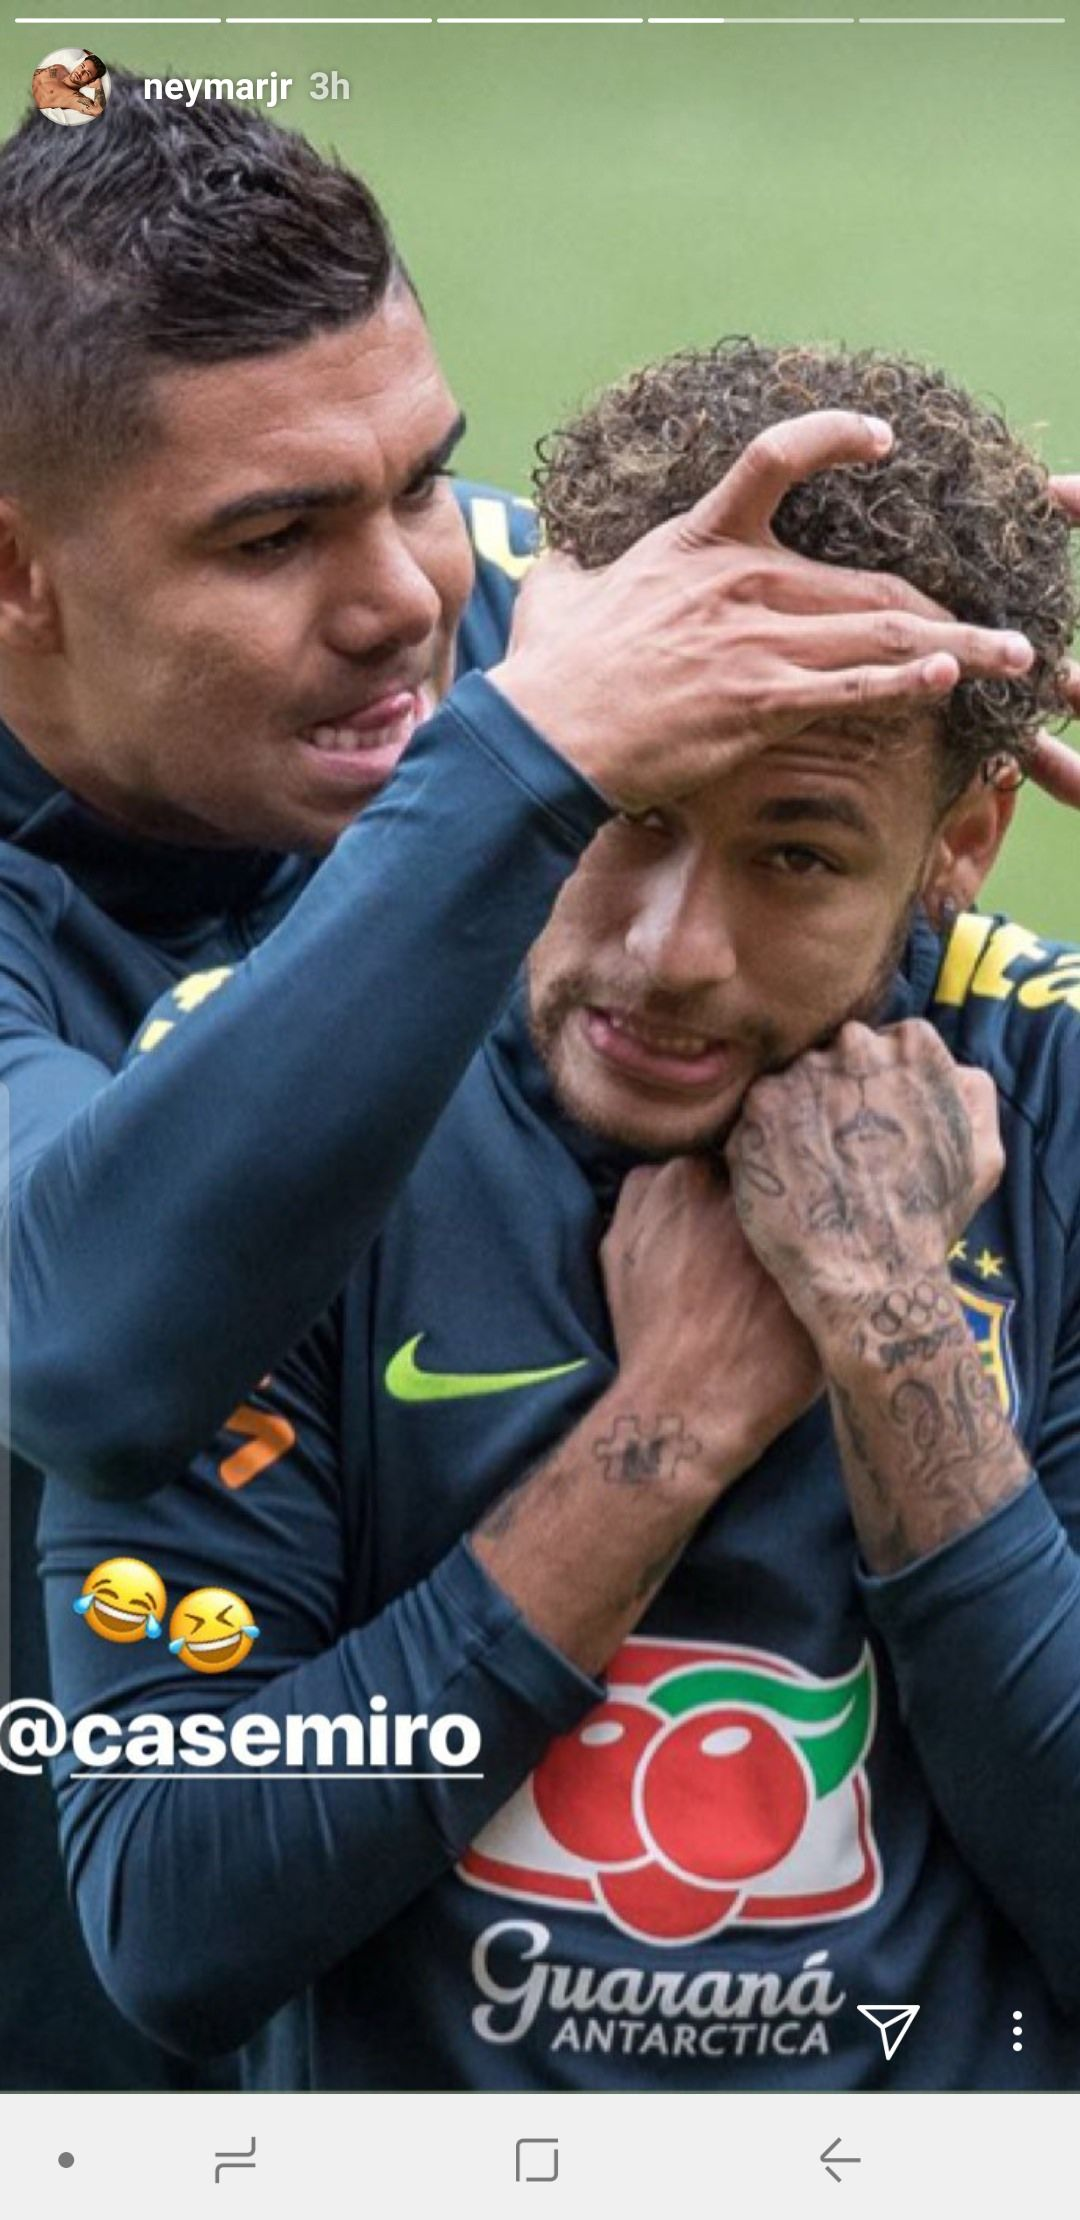 Neymar and Casemiro recreating that famous interaction